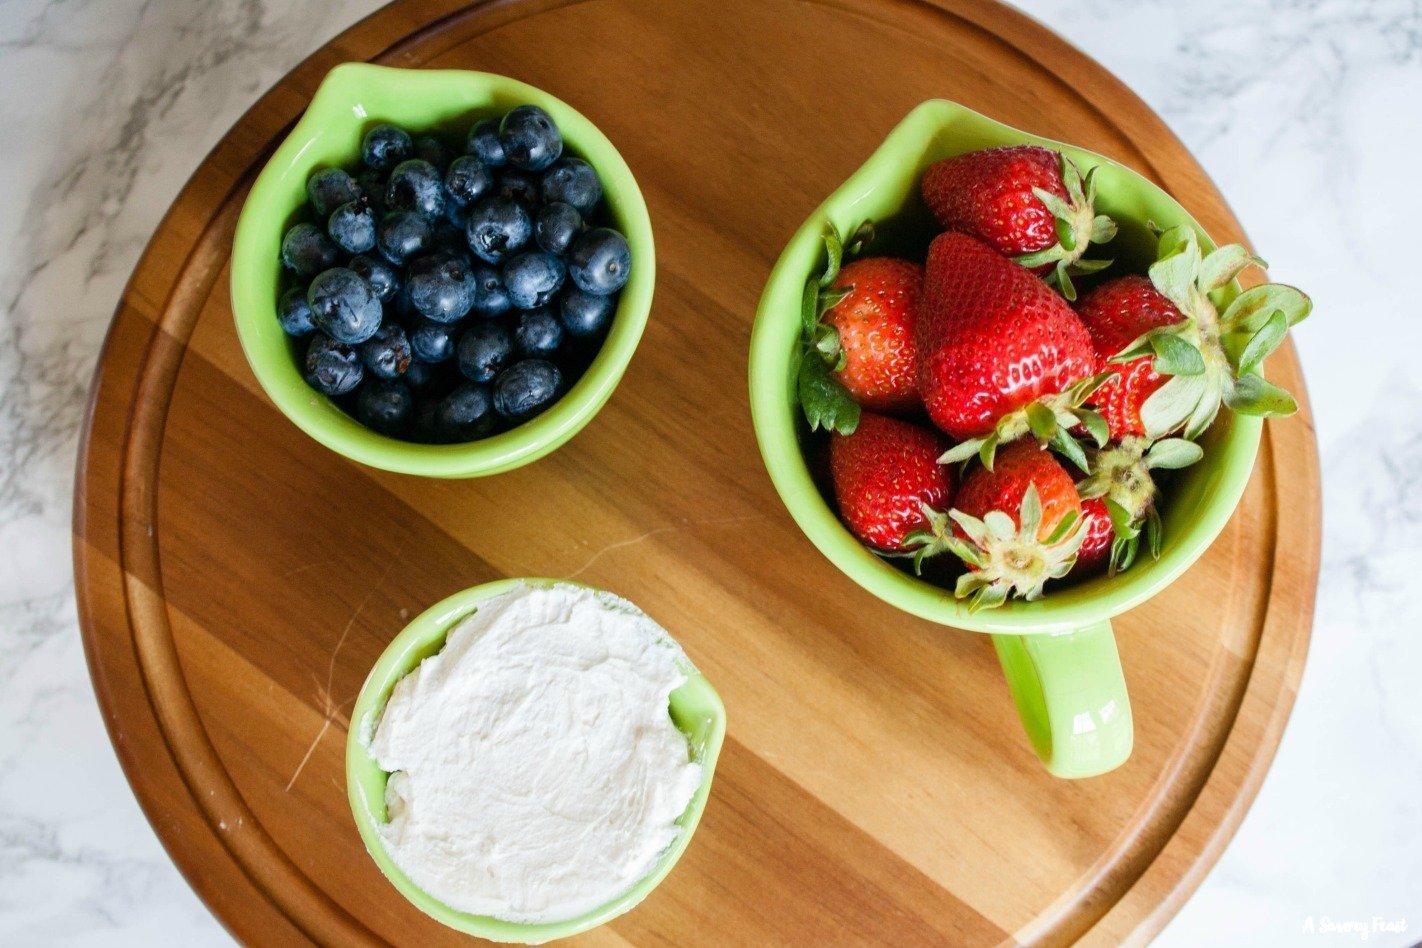 Strawberry and Blueberry dessert idea